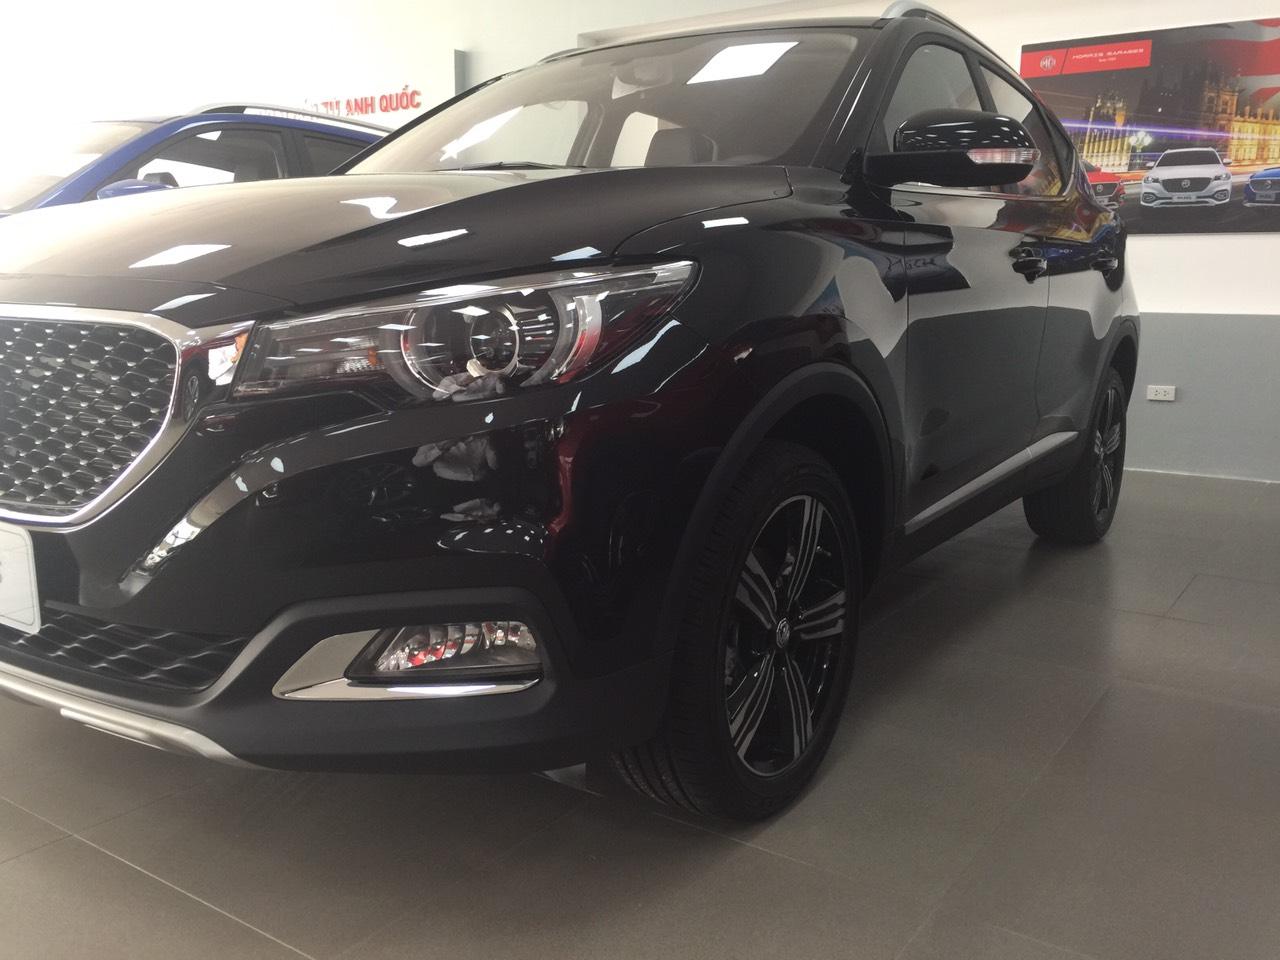 MG ZS 1.5 2WD Luxury